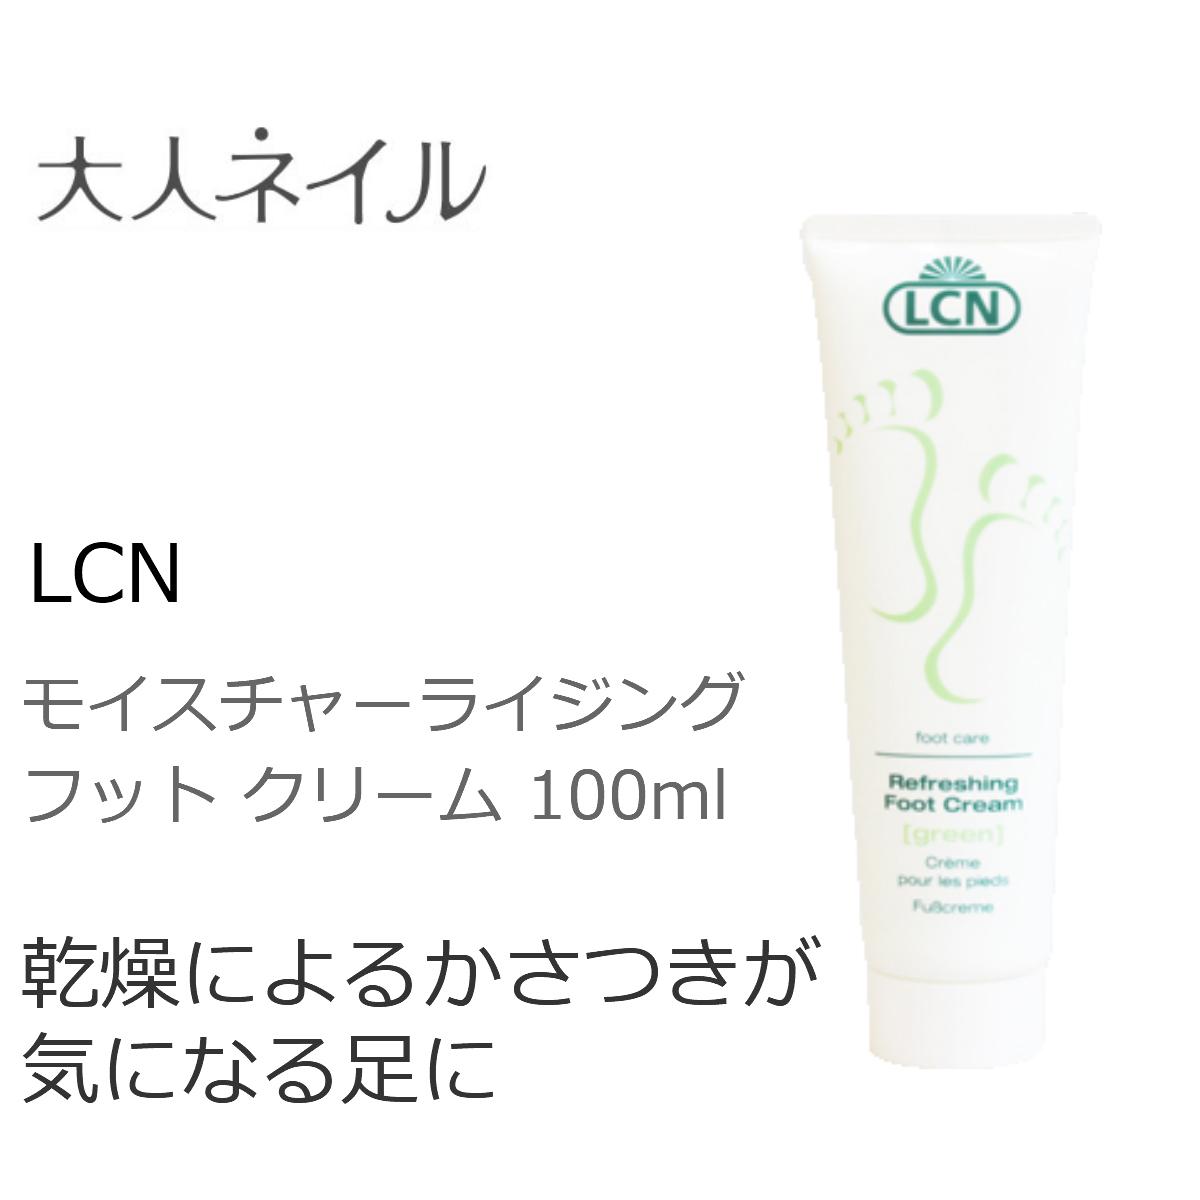 LCN モイスチャーライジング フット クリーム 100ml うるおい 健やか 乾燥 かさつき